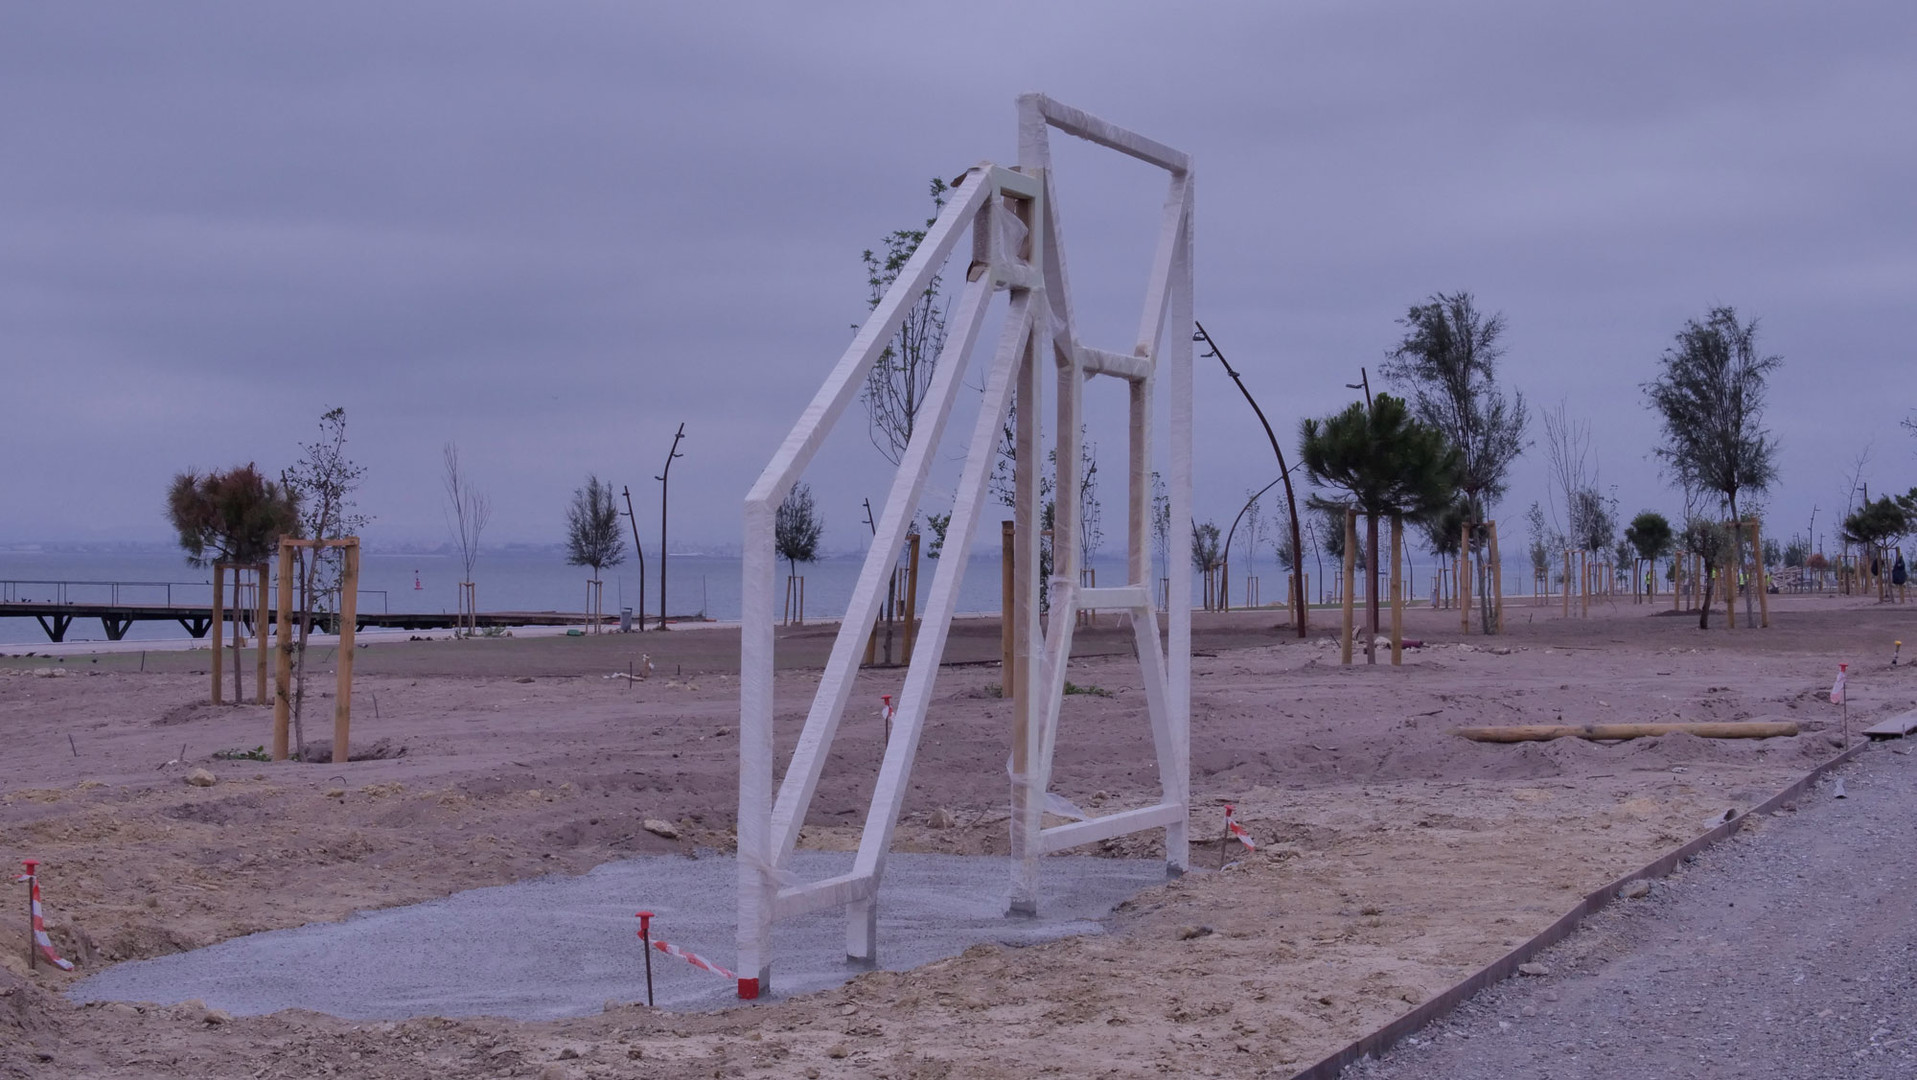 escultura-solar-4c.jpg